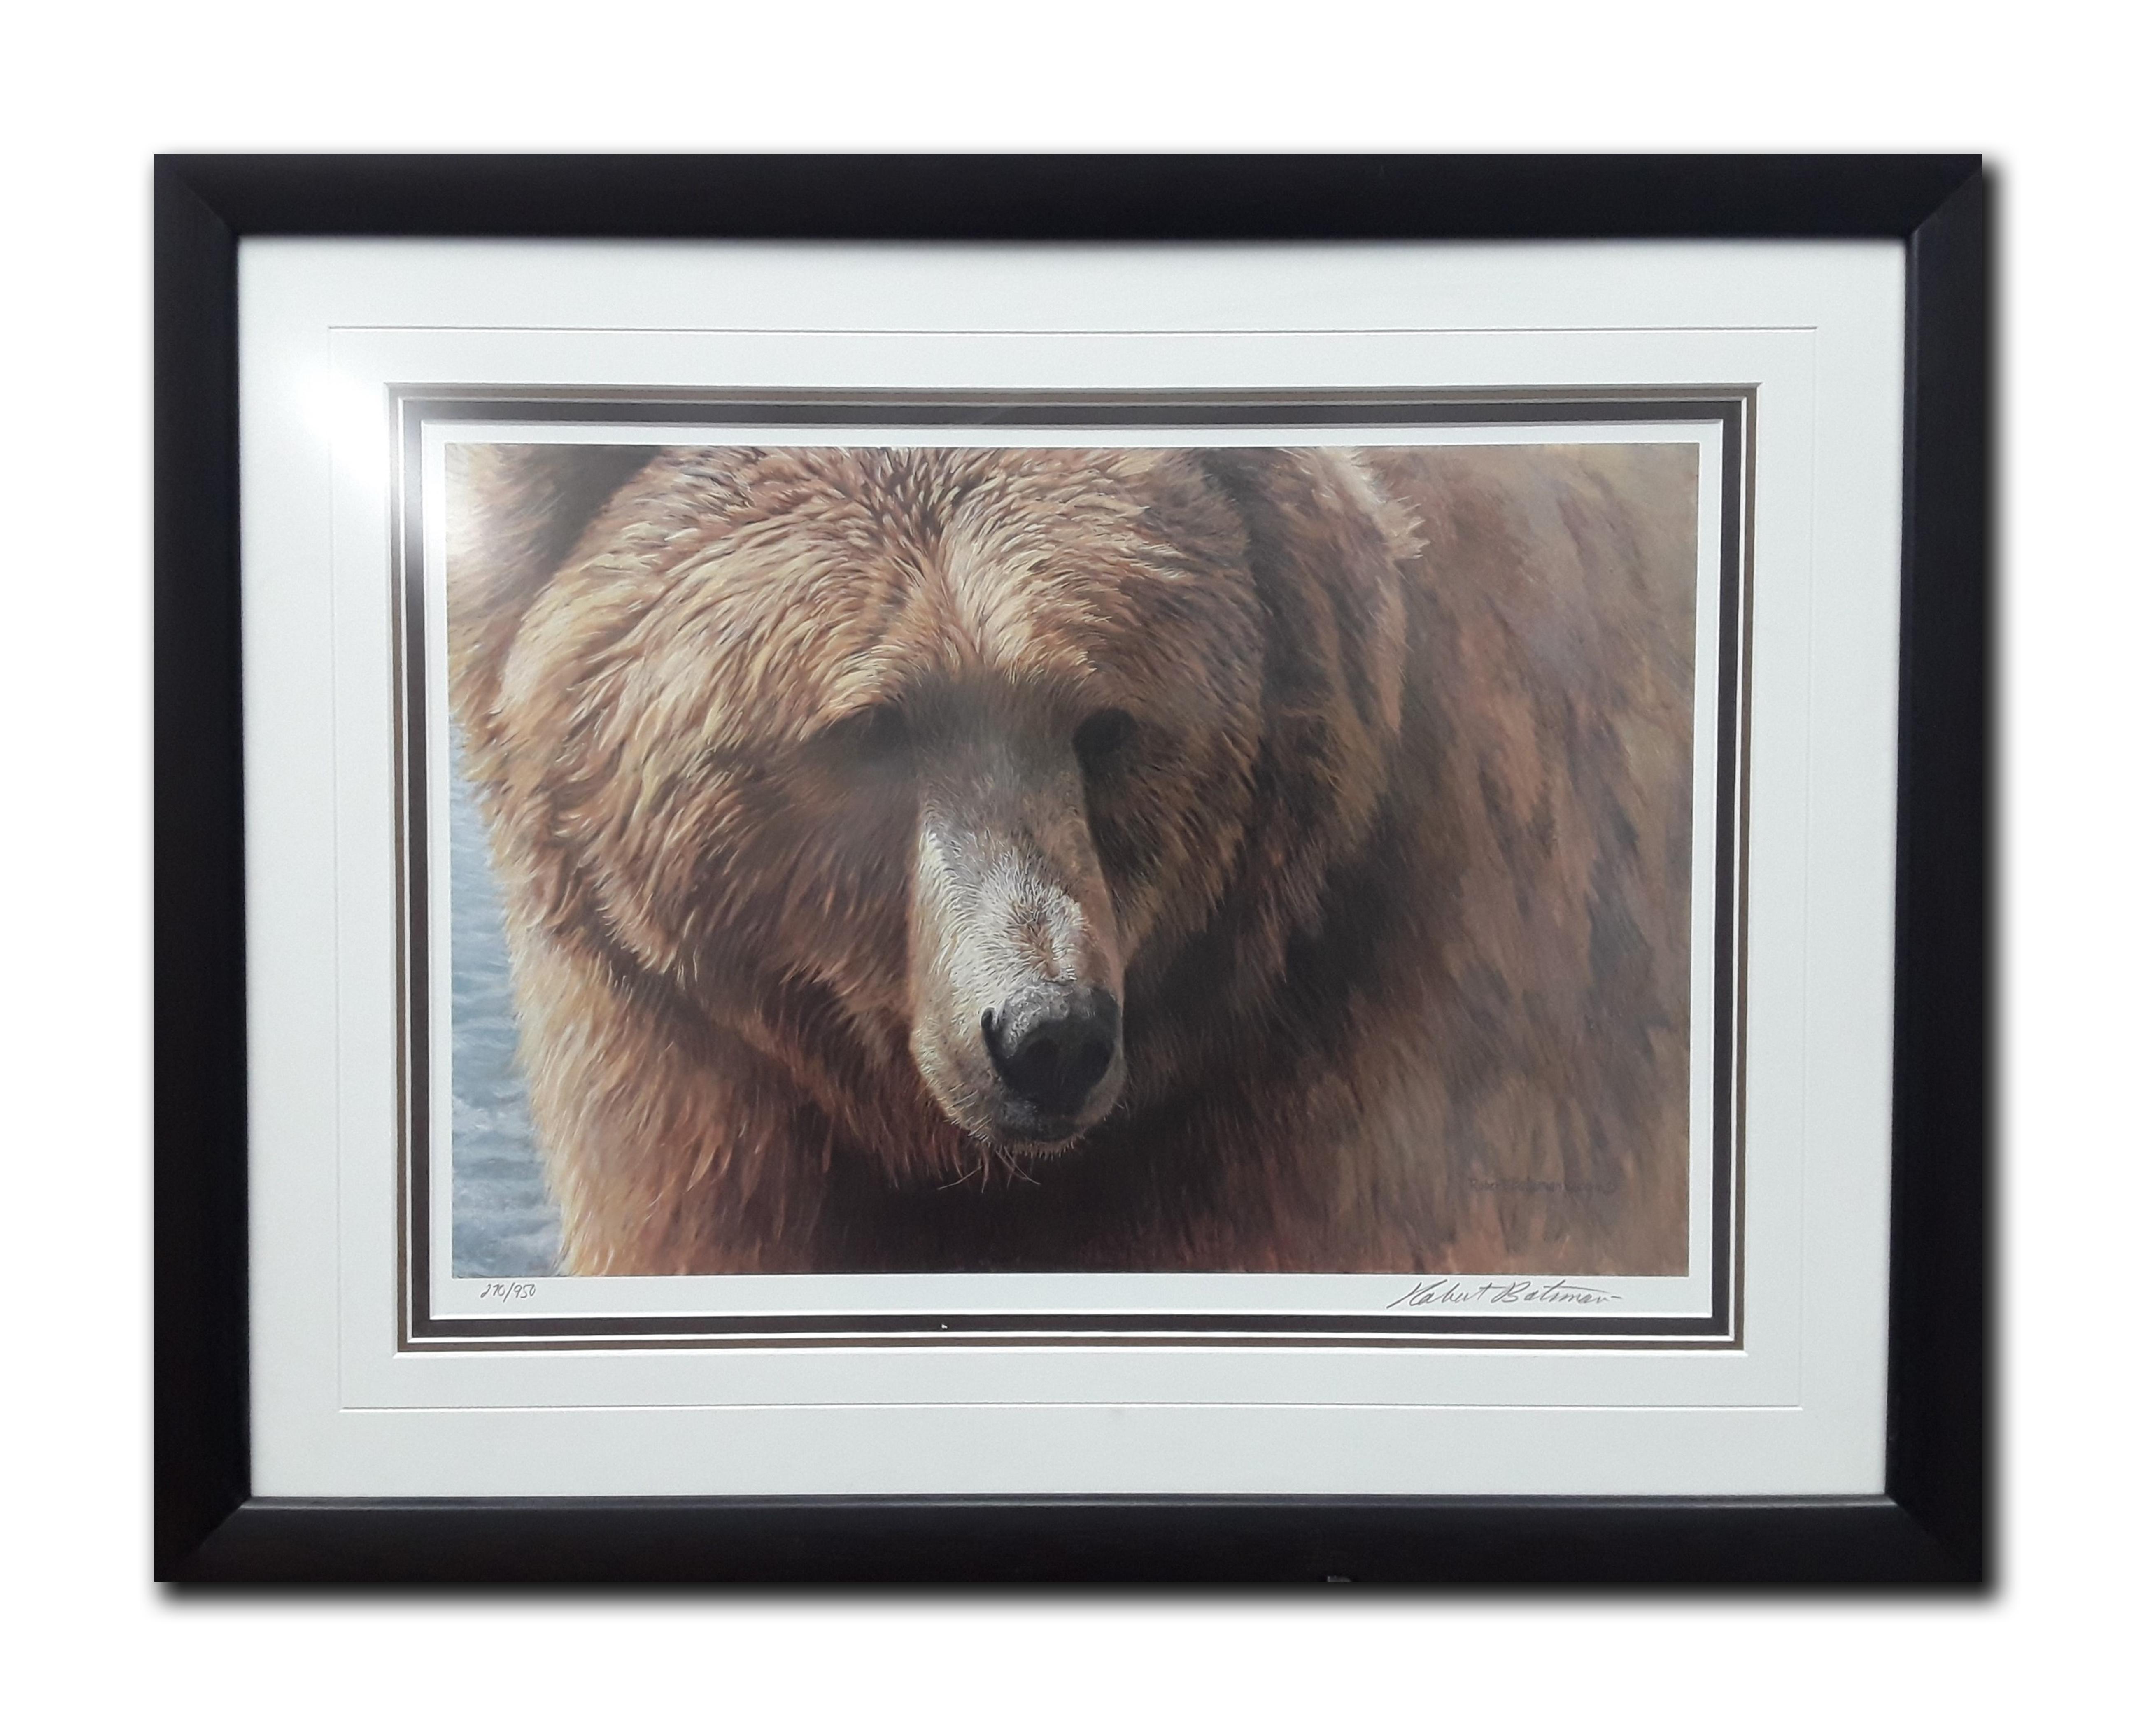 "Robert Bateman's ""Grizzly Head Portrait"" Limited Edition Framed Print"